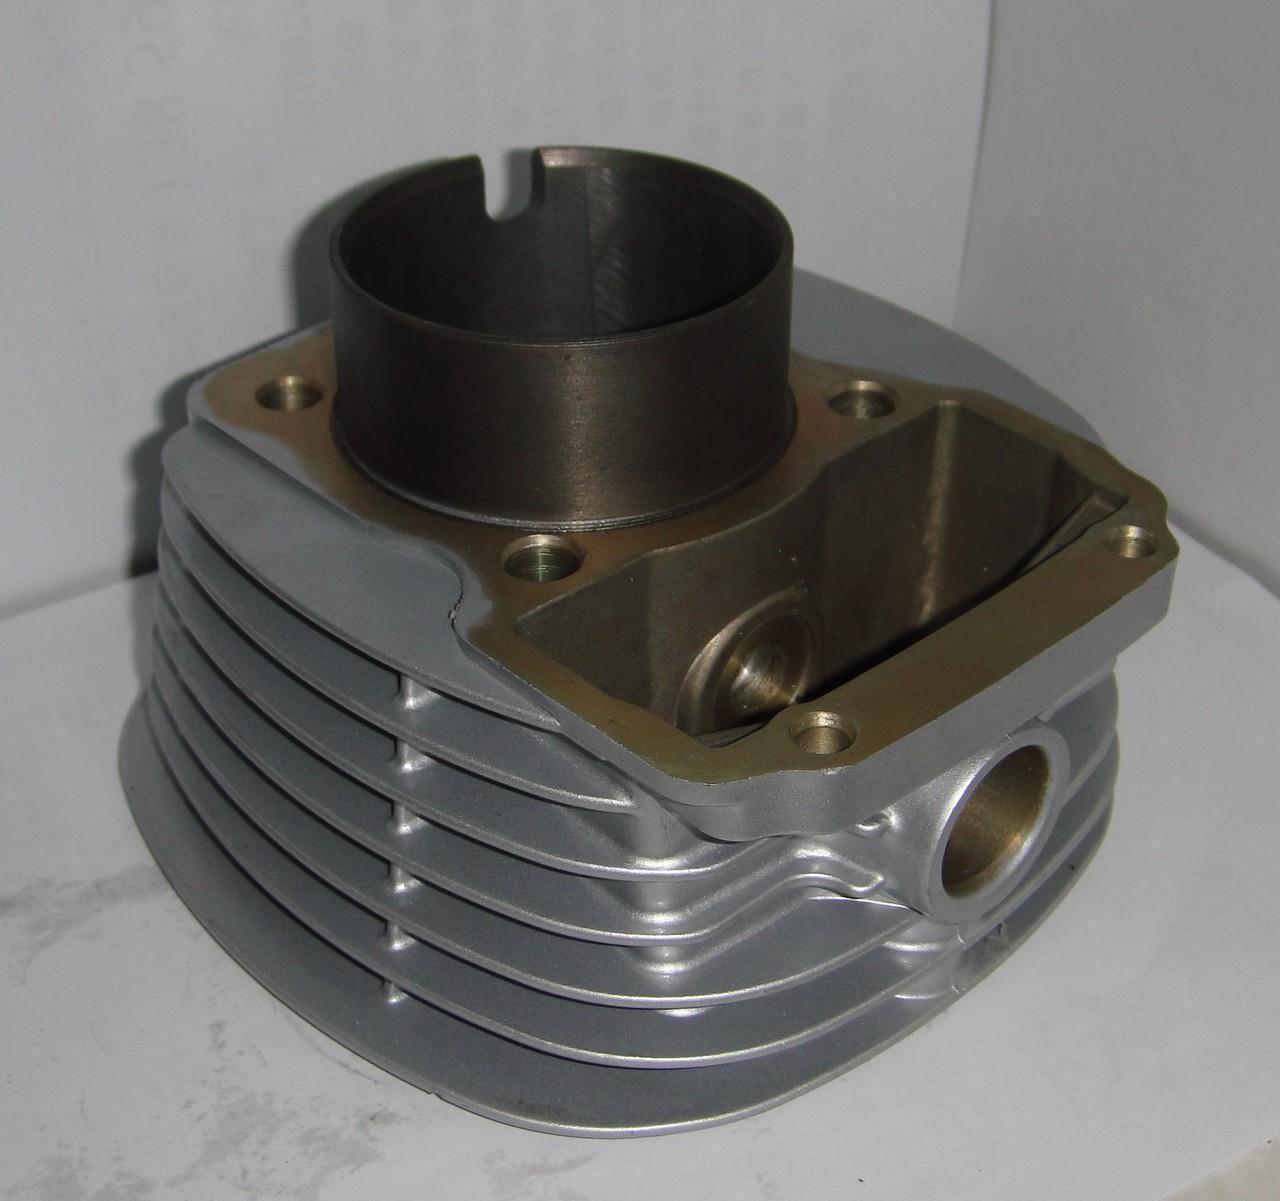 Engine Block, Cylinder Block, Cg150, Horse 150, 149cc